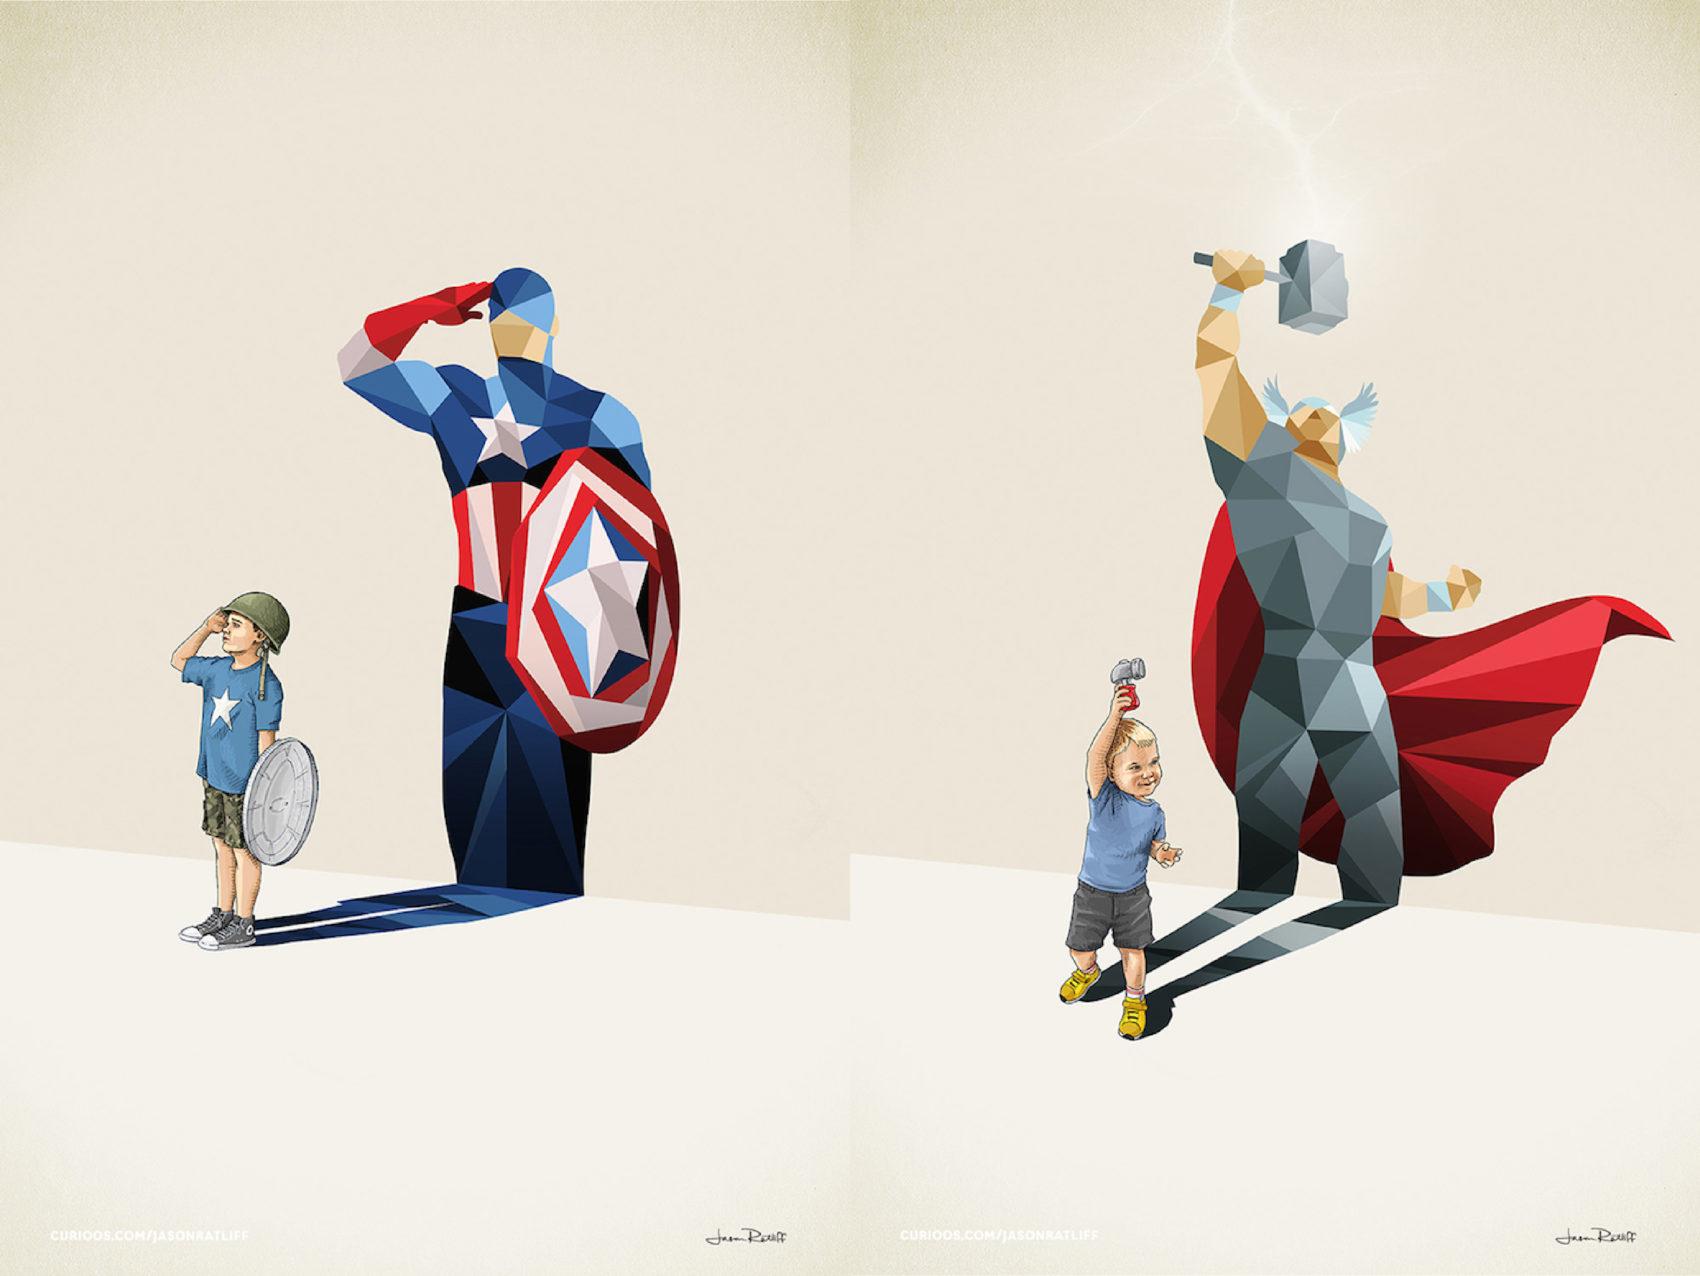 Creative Illustration of childhood imagination by Jason Ratliff